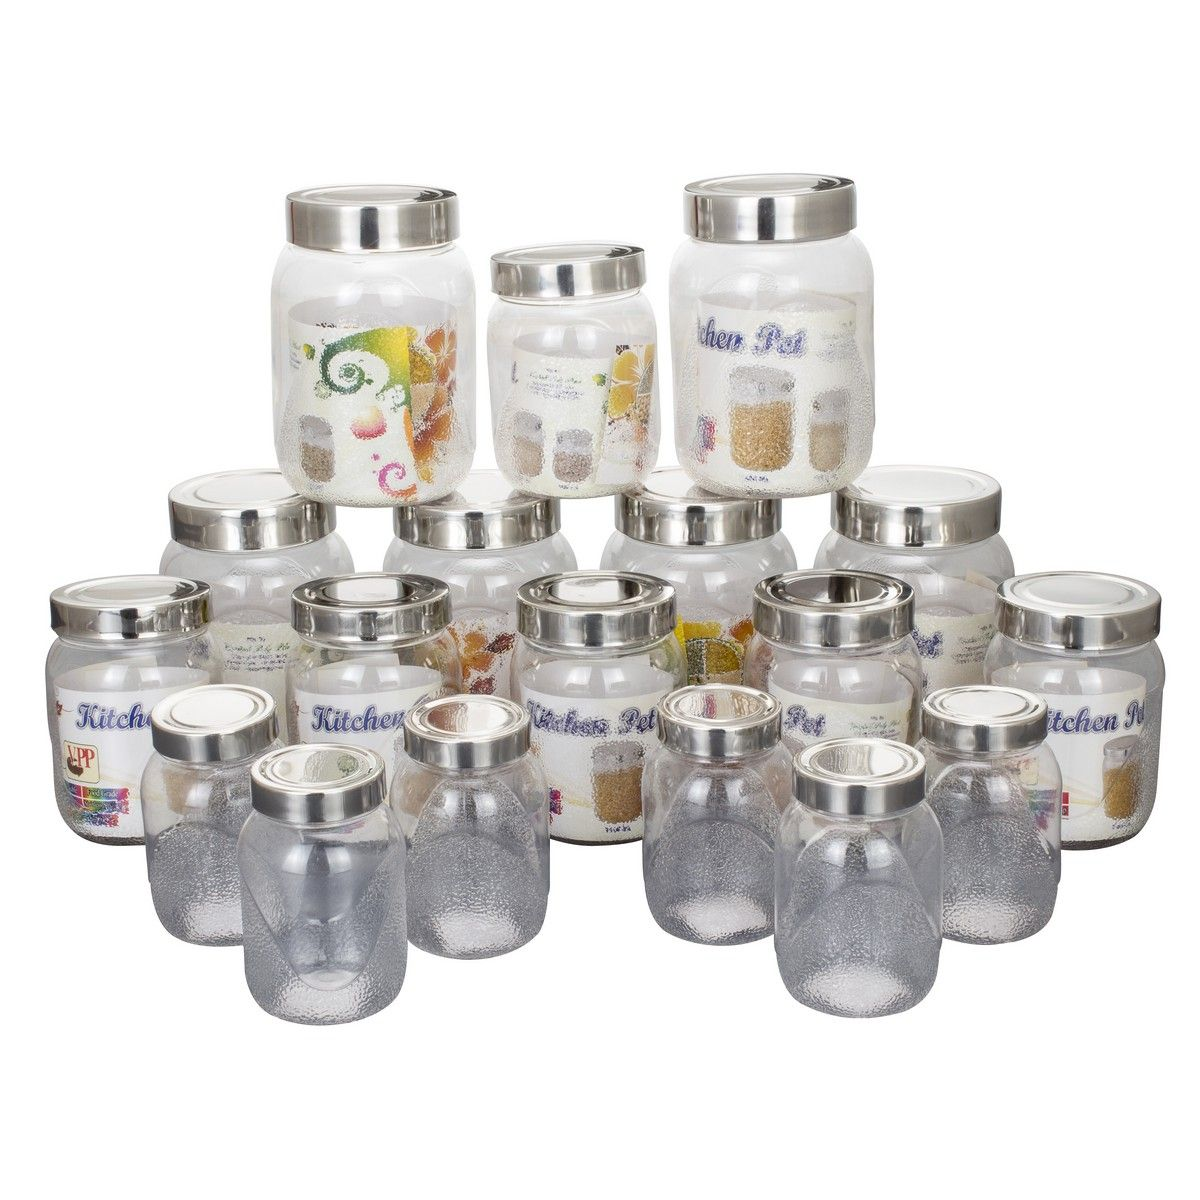 Buy klassic vimal kitchens pet set of 18pcs kv089 online for Kitchen set naaptol